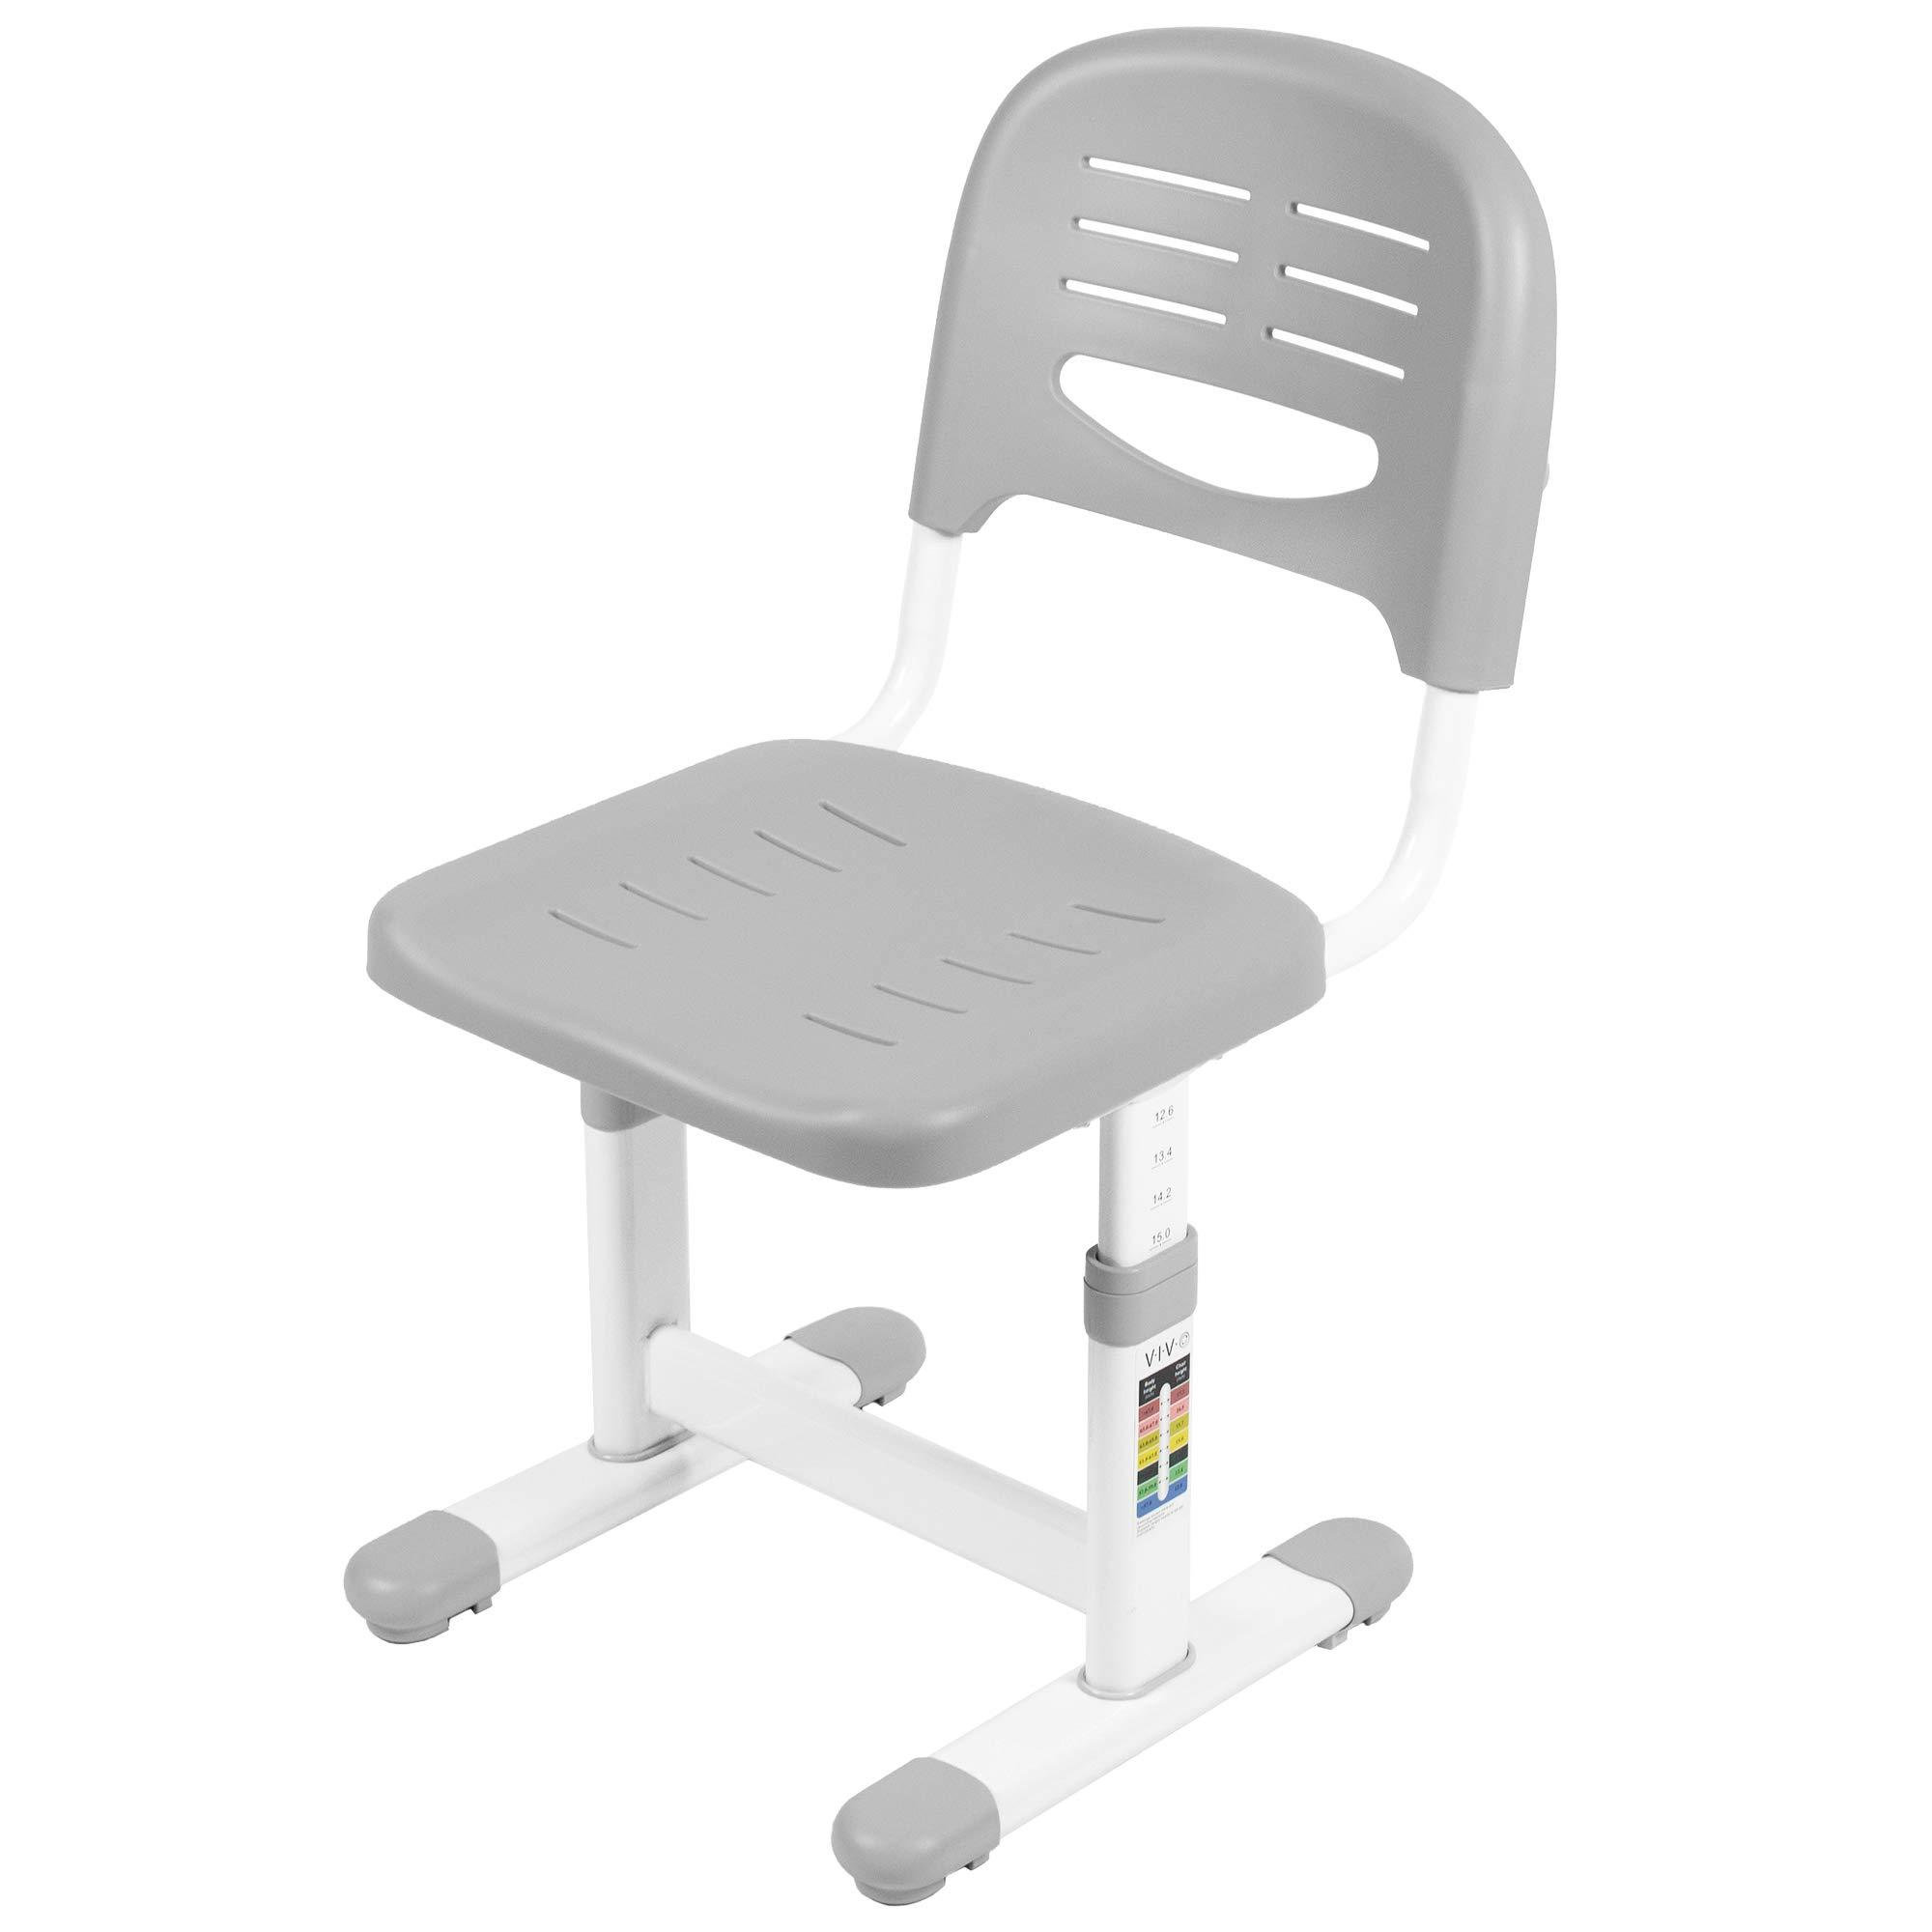 VIVO Gray Height Adjustable Kids Desk Chair (Chair Only) Designed for Interactive Workstation   Universal Children's Ergonomic Seat (DESK-V201G-CH) by VIVO